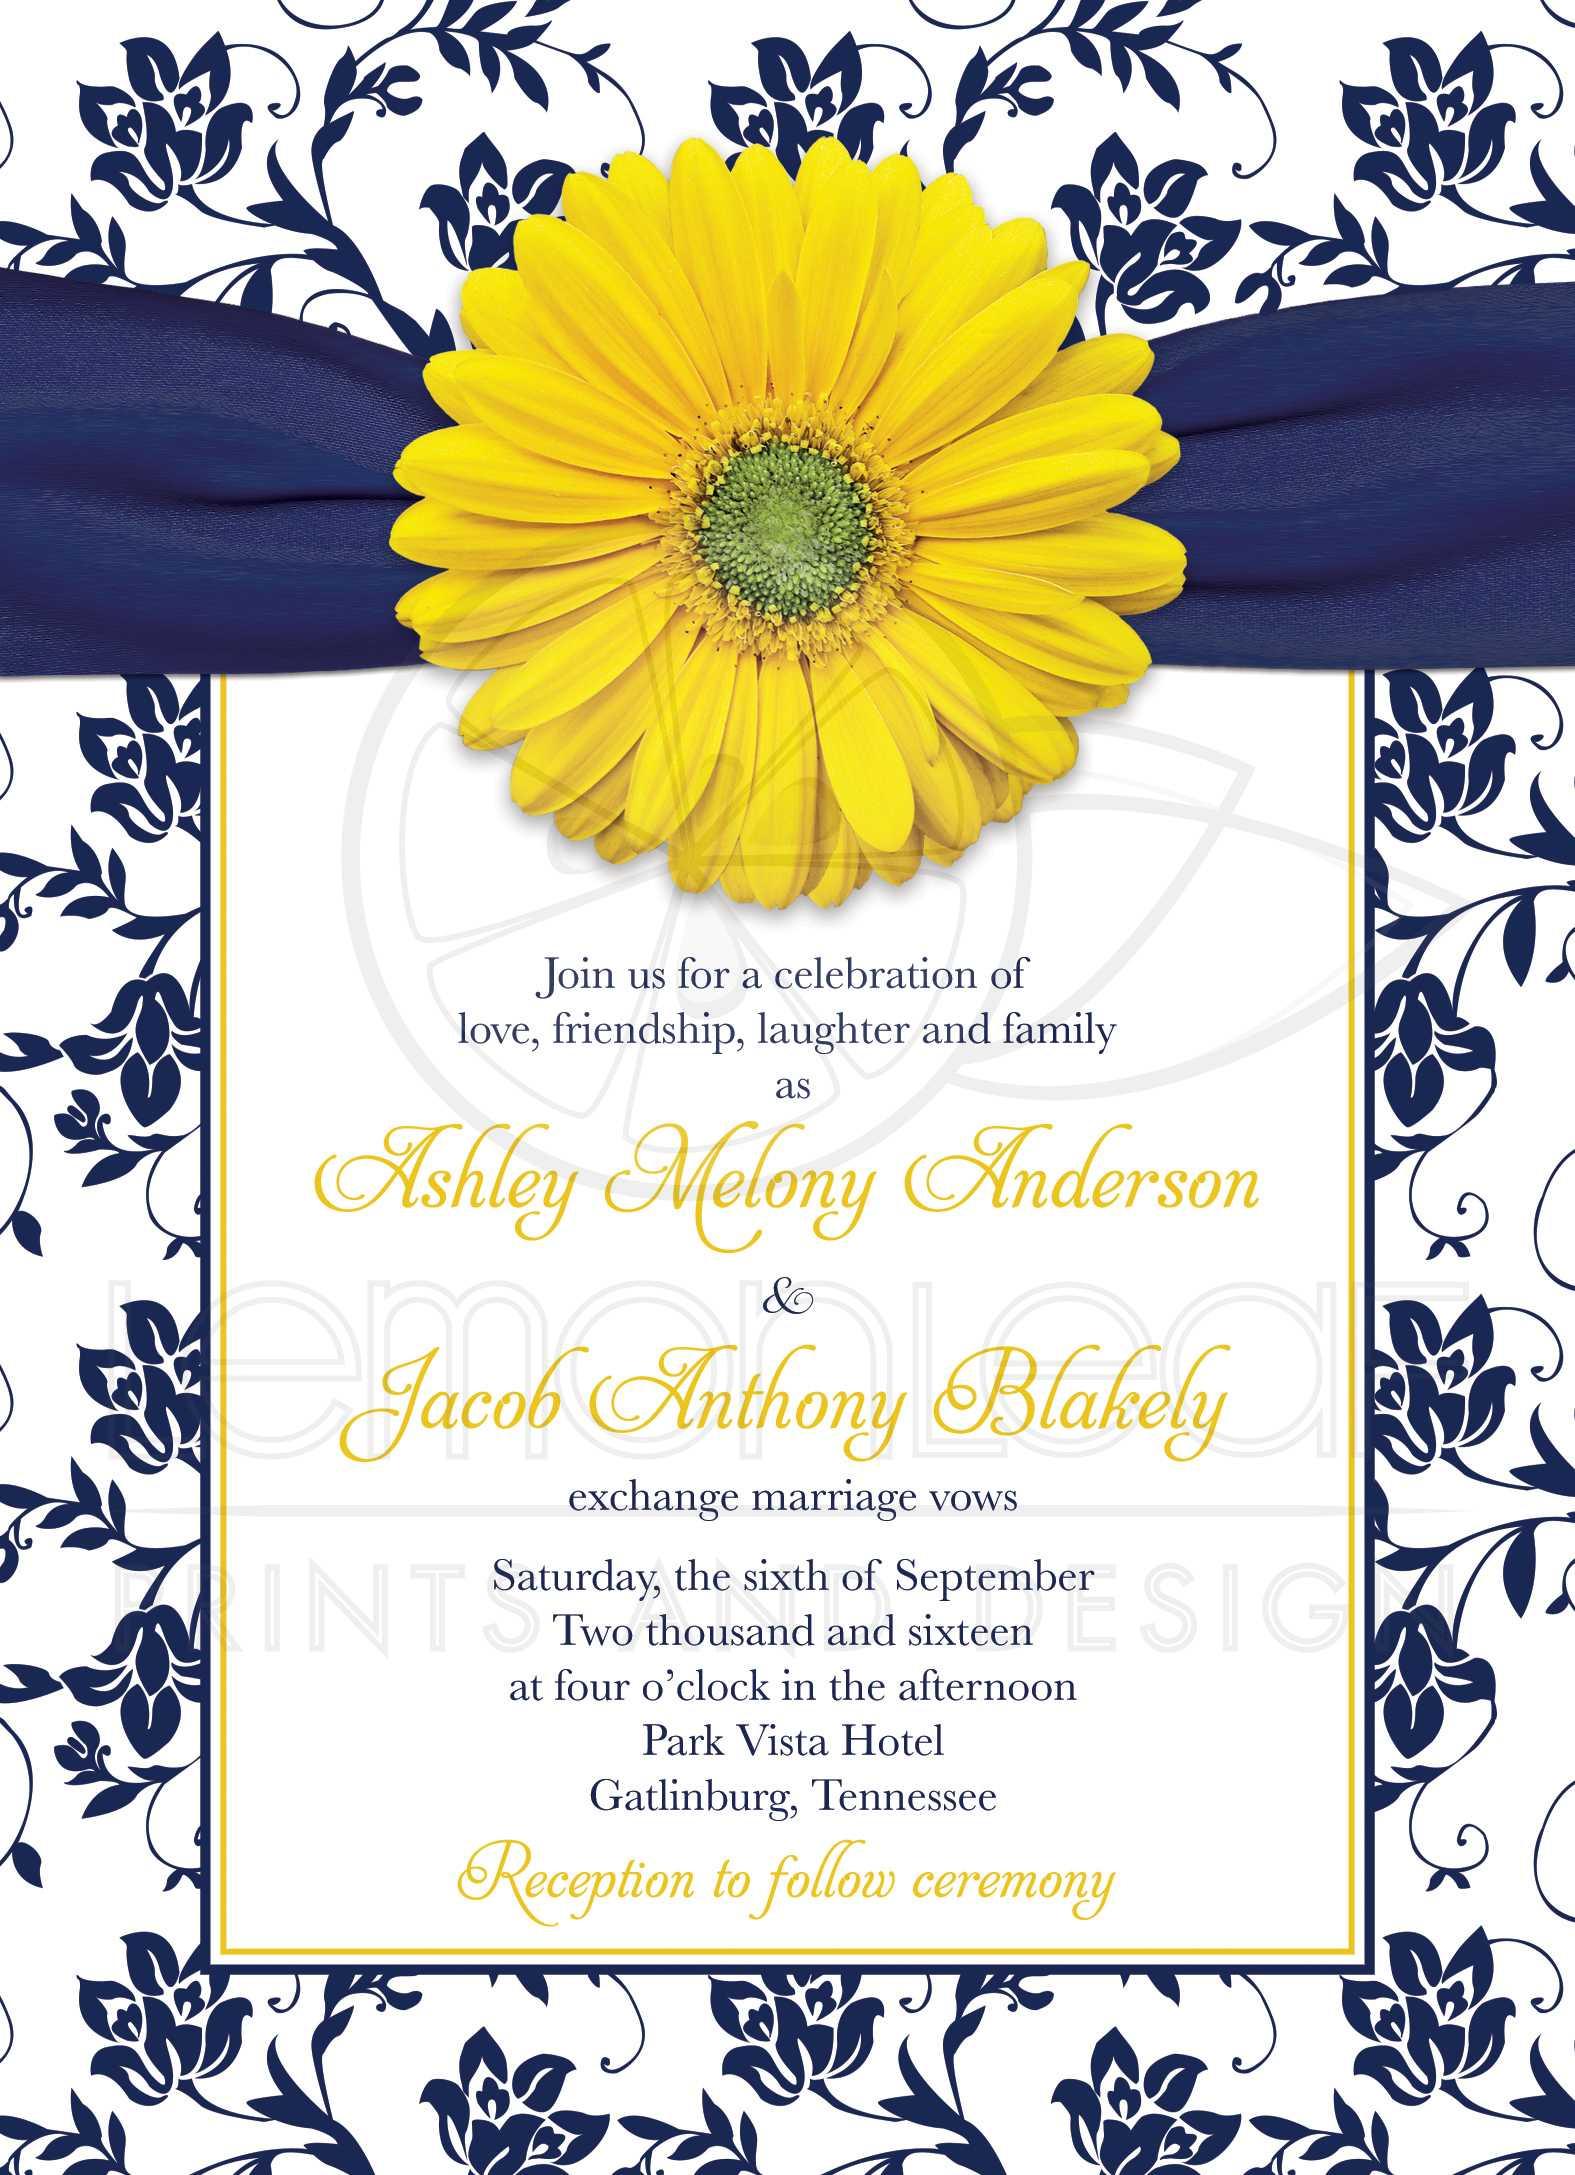 Yellow Daisy Navy Floral Wedding Invitation | Navy Blue Yellow Damask